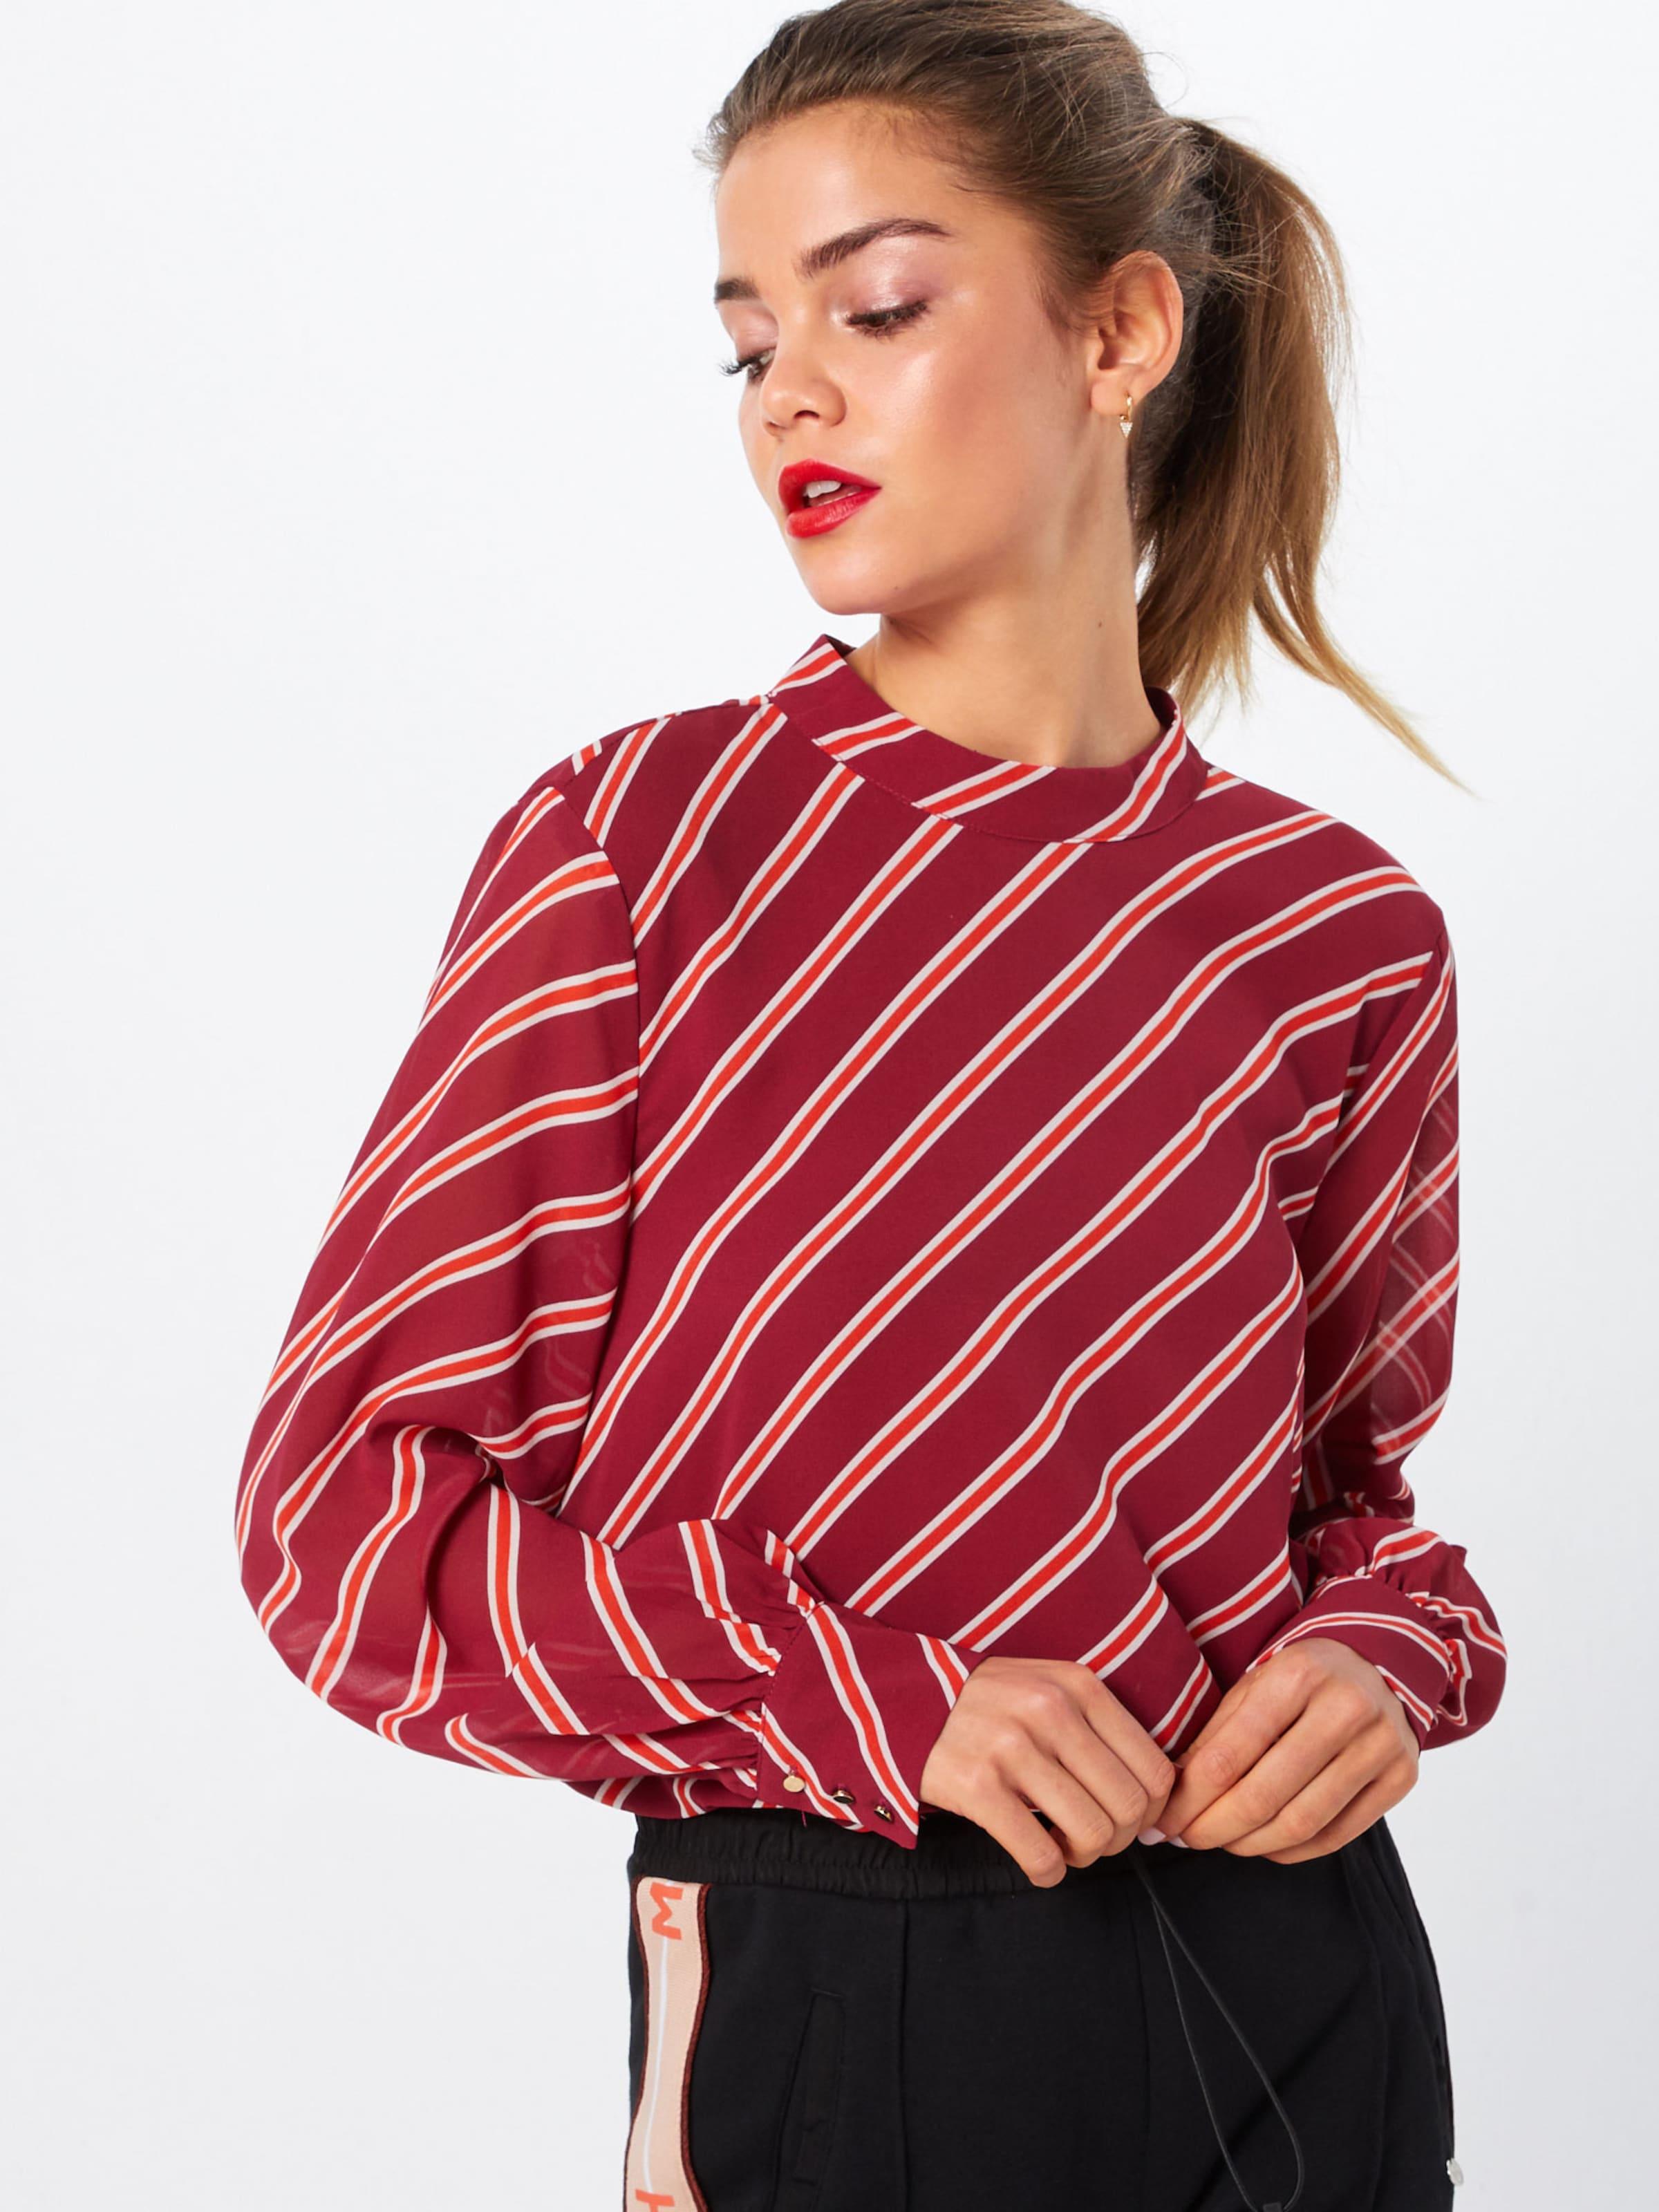 RotWeiß 'ixeline Ichi Bluse Ls' In 35LAR4qj